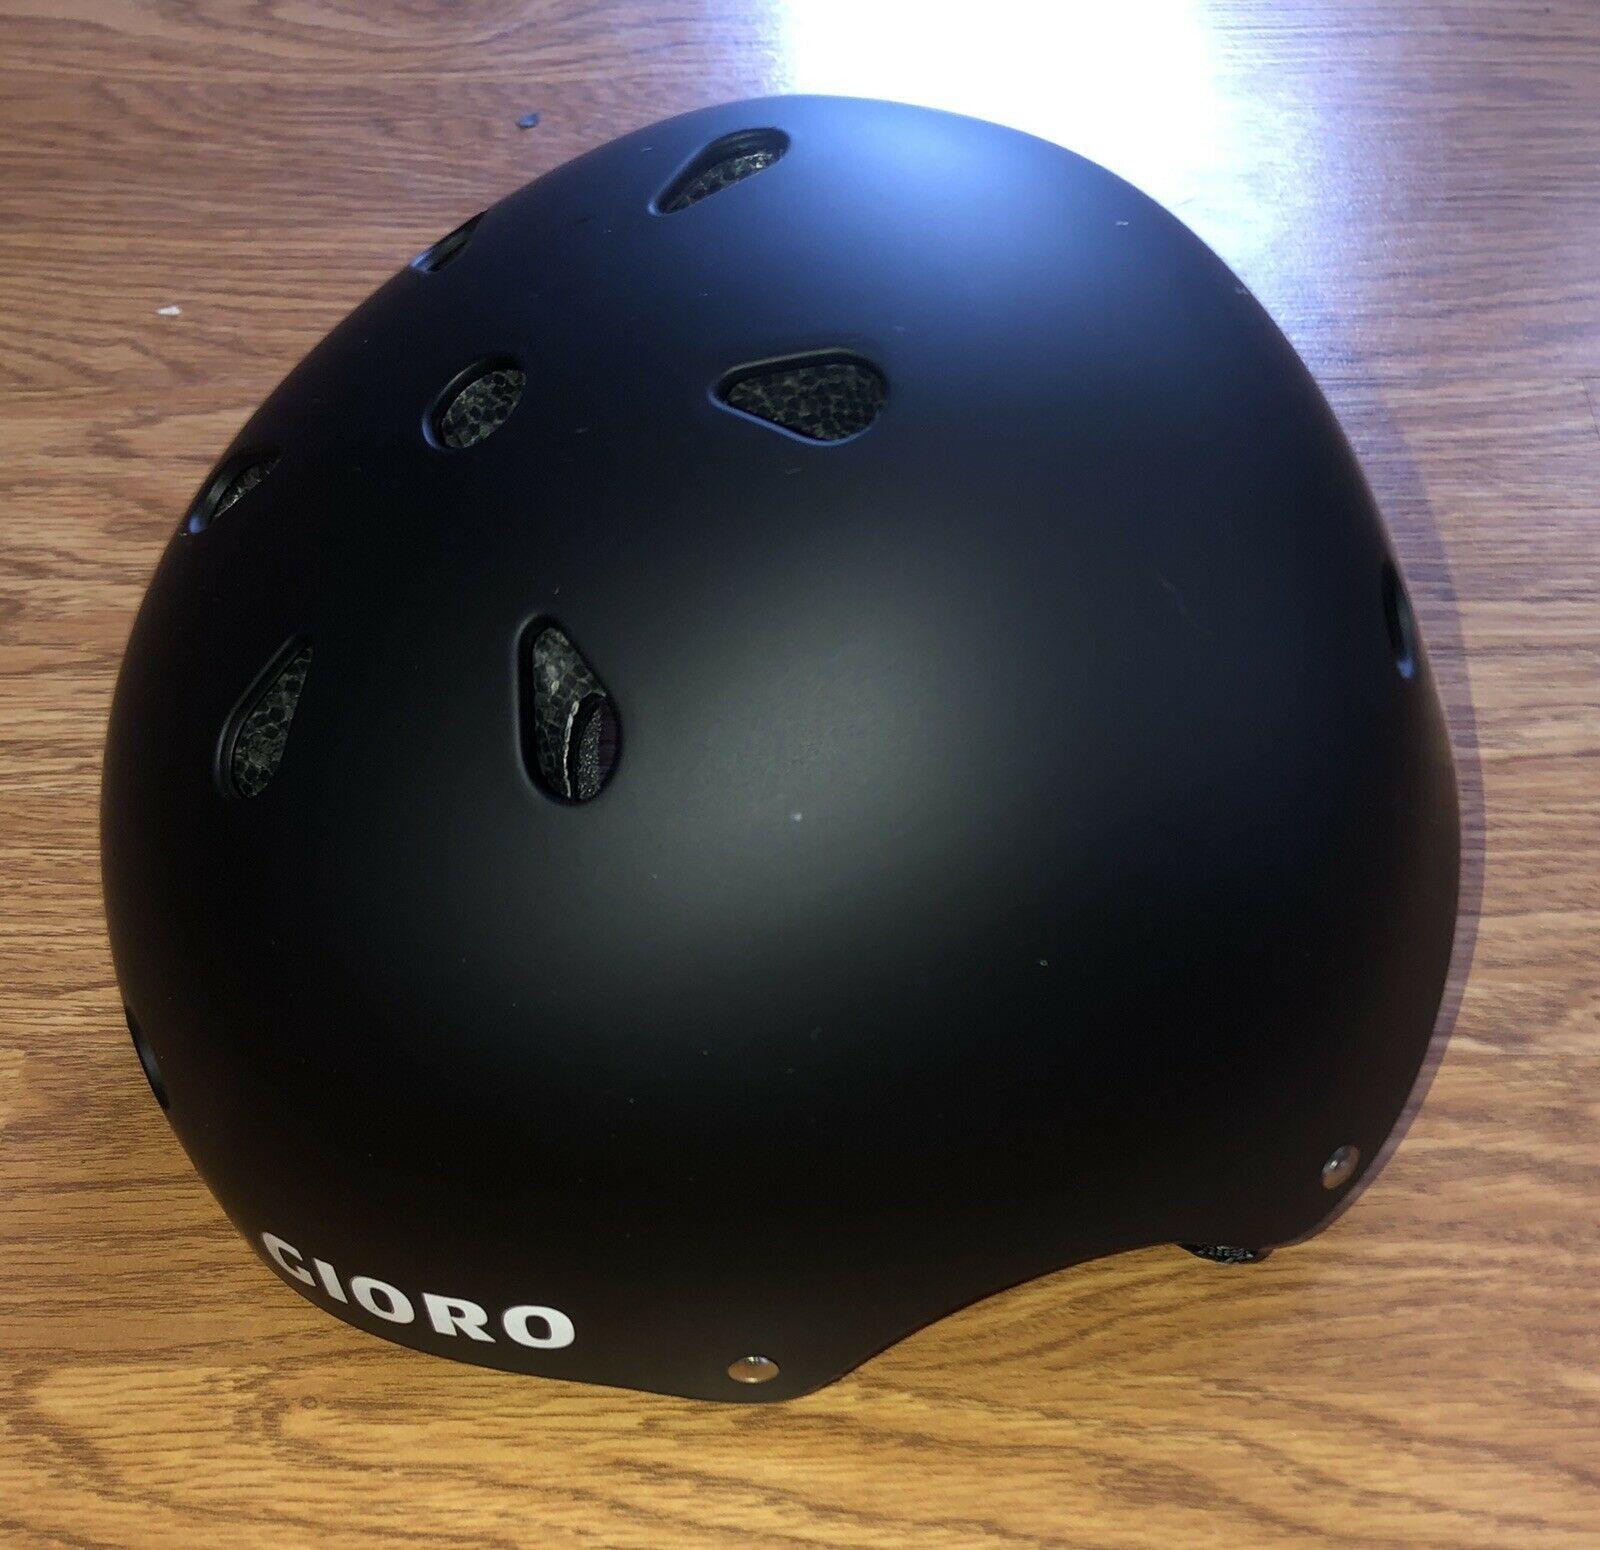 New Gioro Jasebords Skateboarding Bicycle Helmet Small